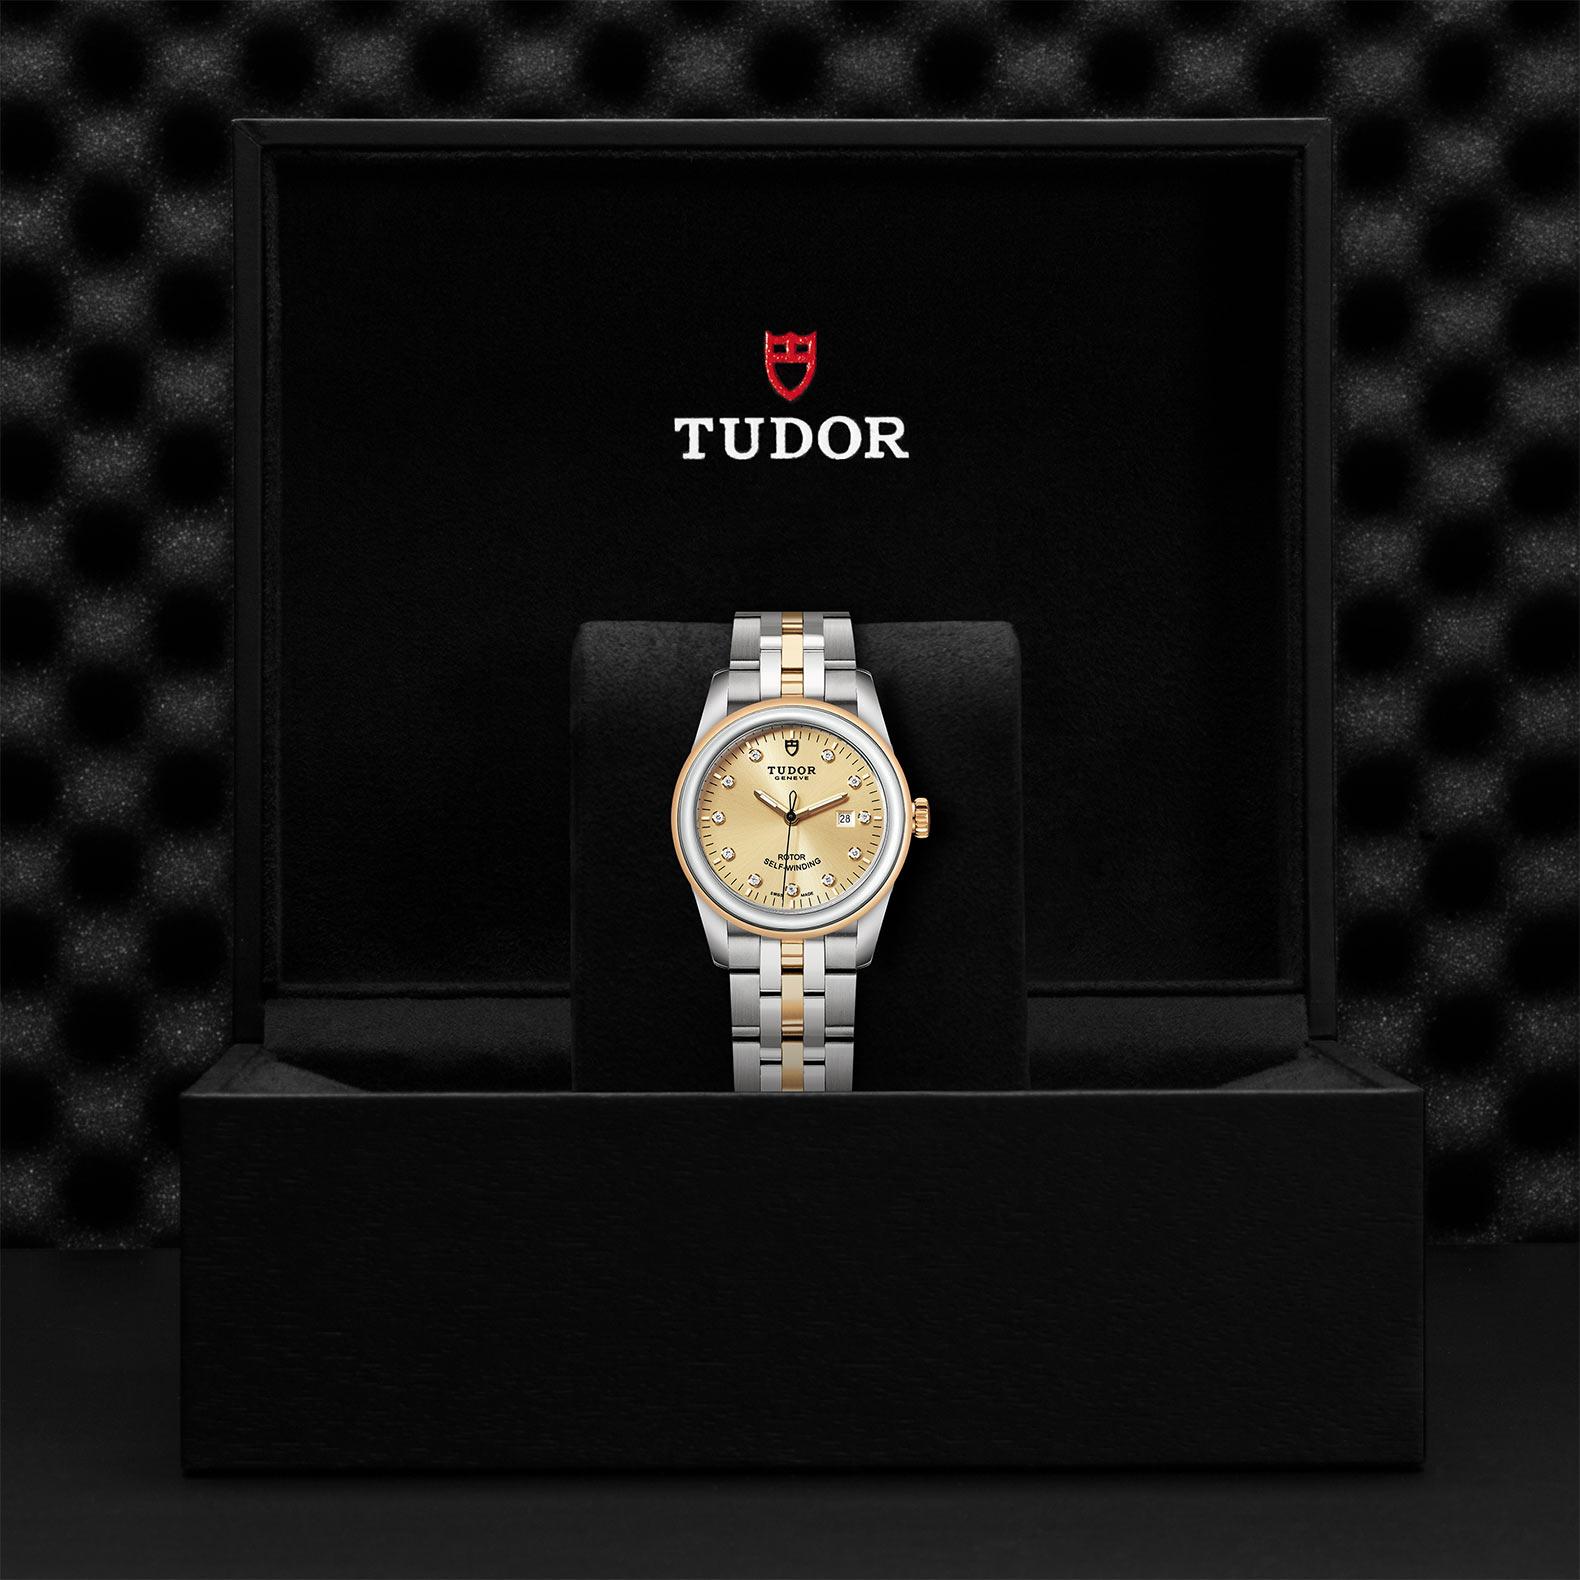 TUDOR Glamour Date - M53003-0006